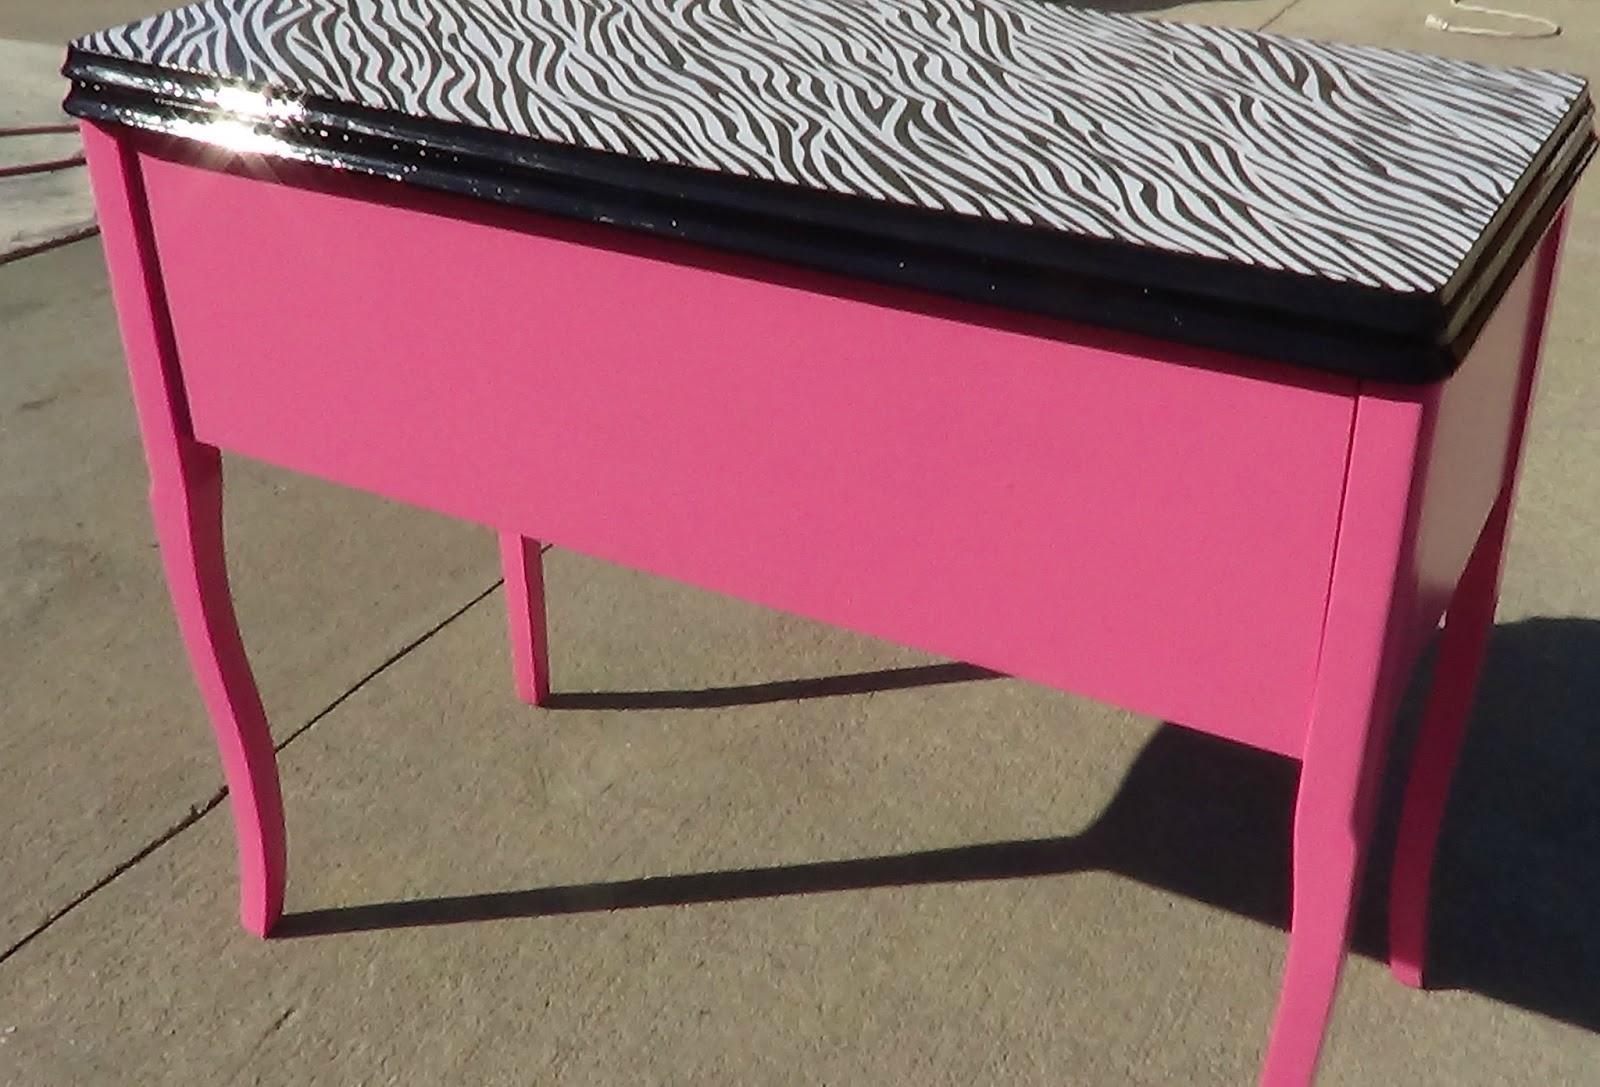 Thats Not JunkRefurbished Recycled Furniture Hot Pink